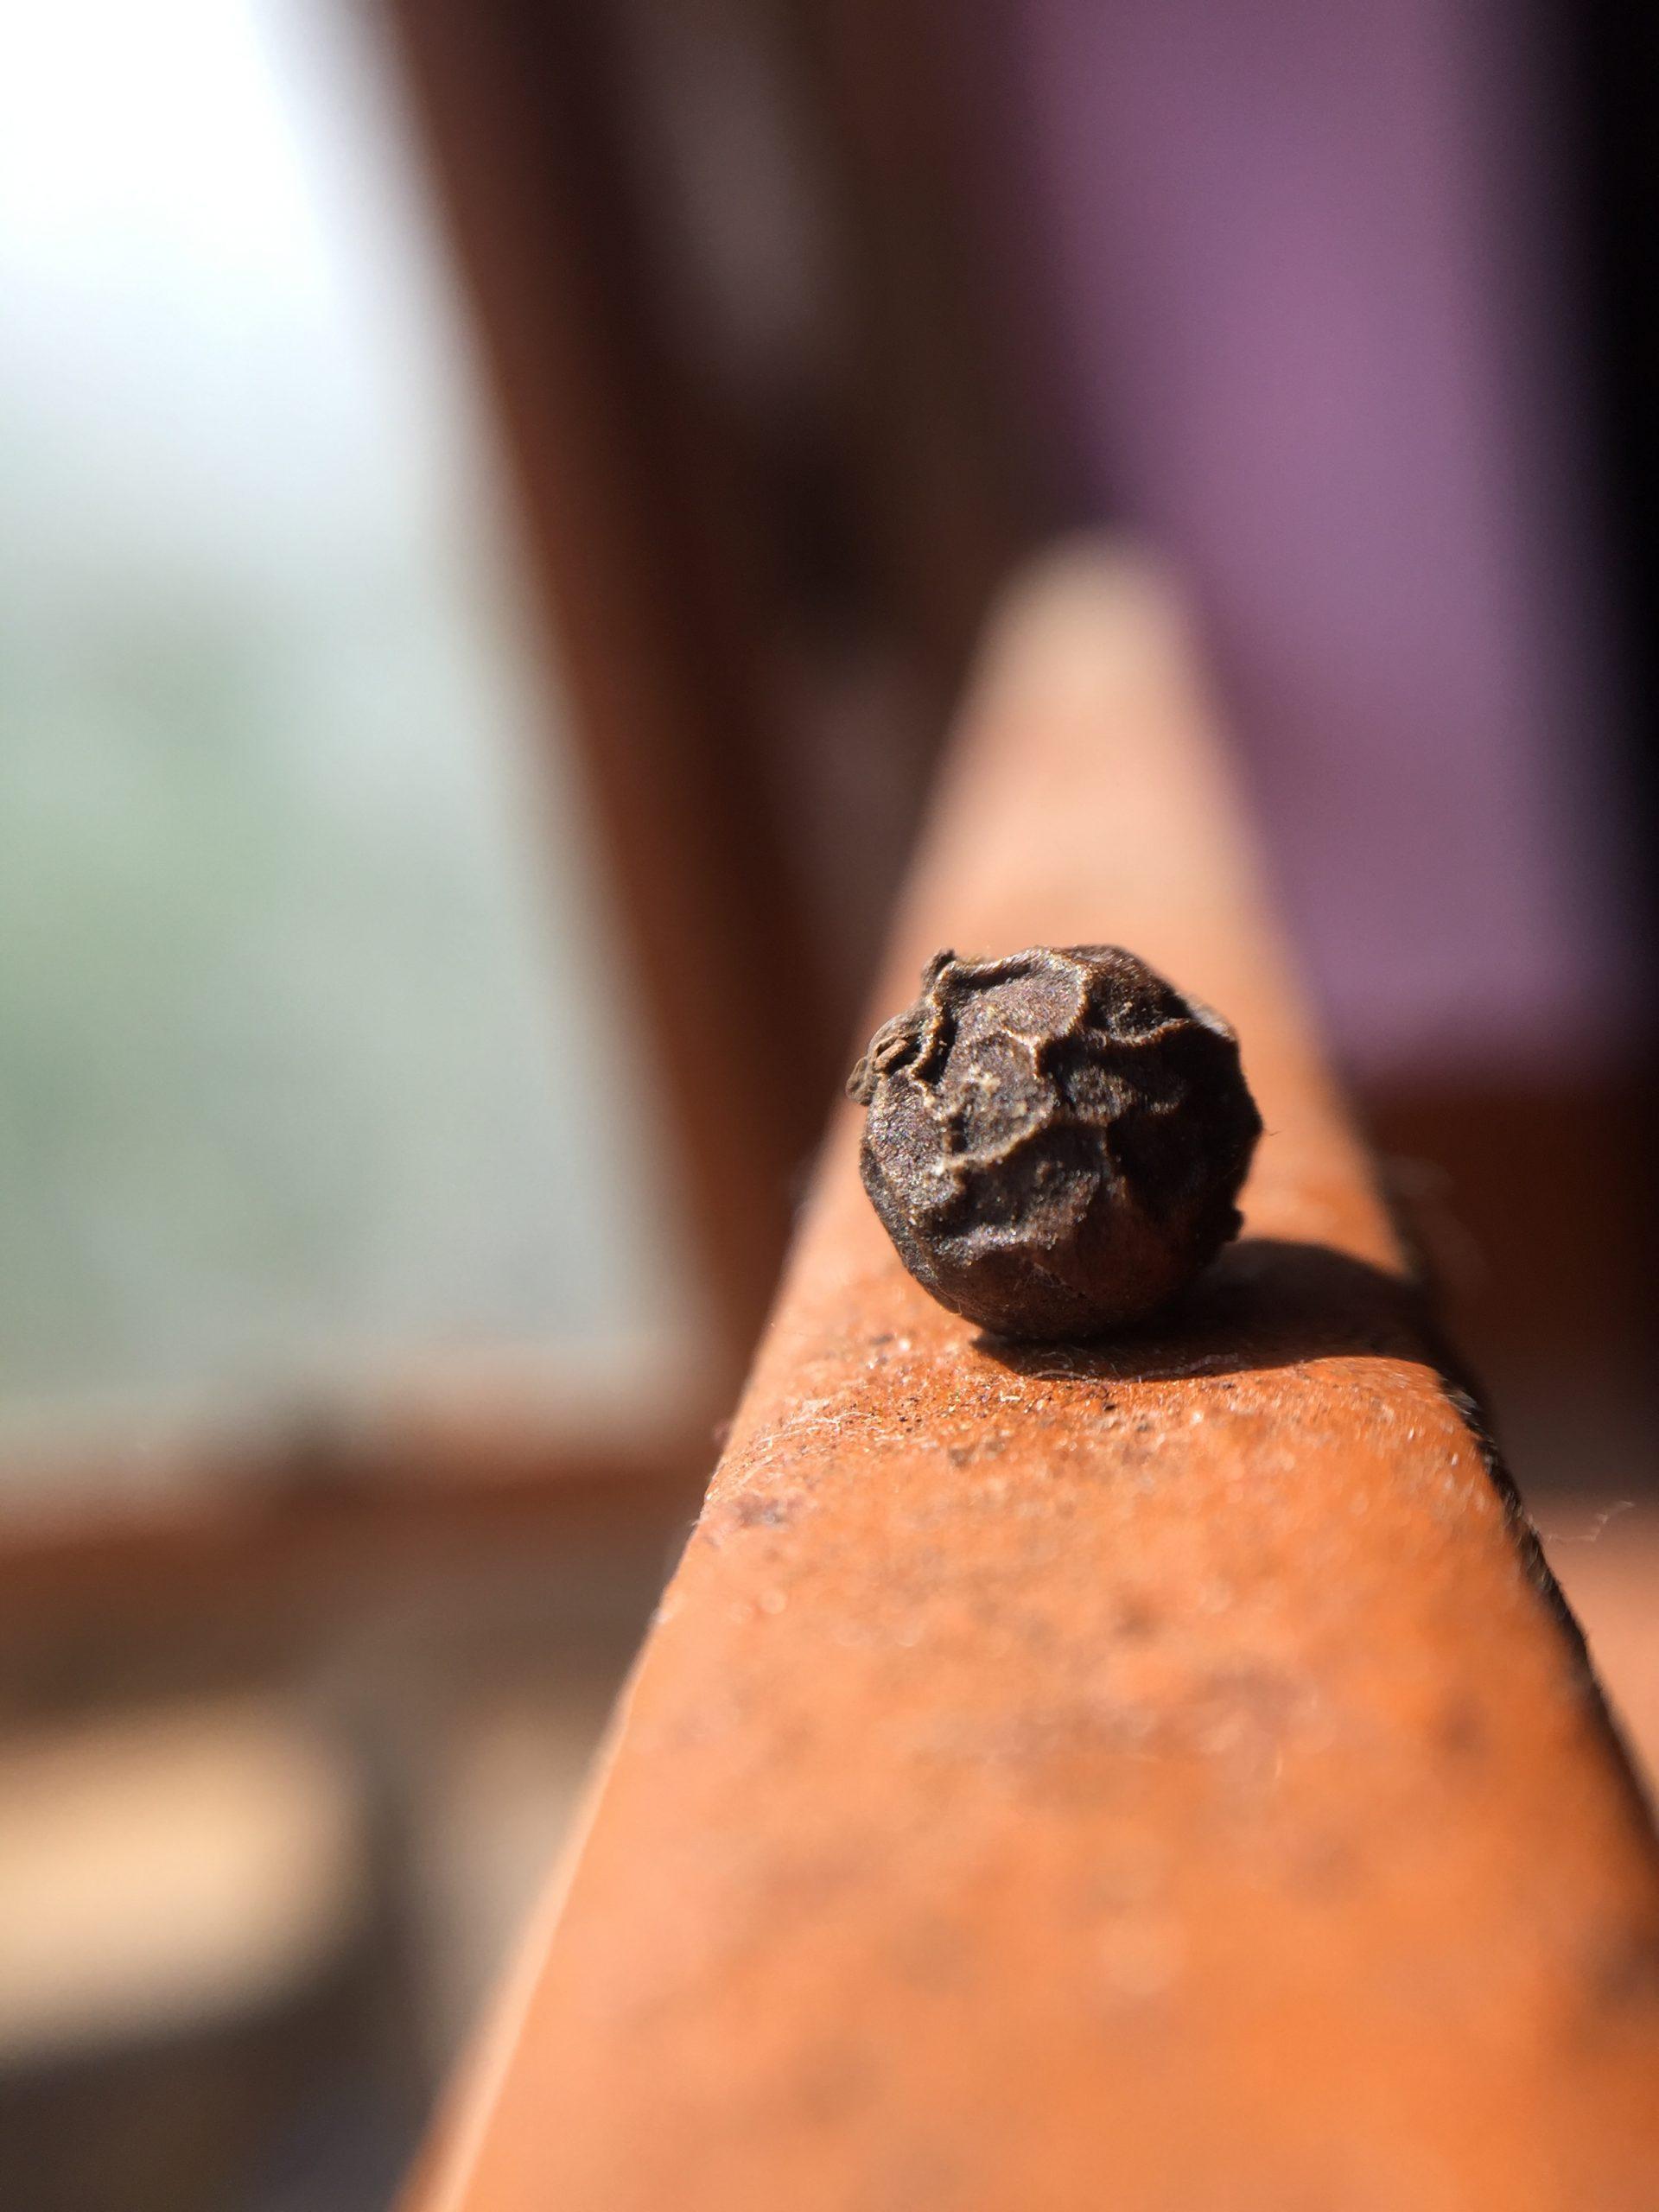 Piece of black pepper